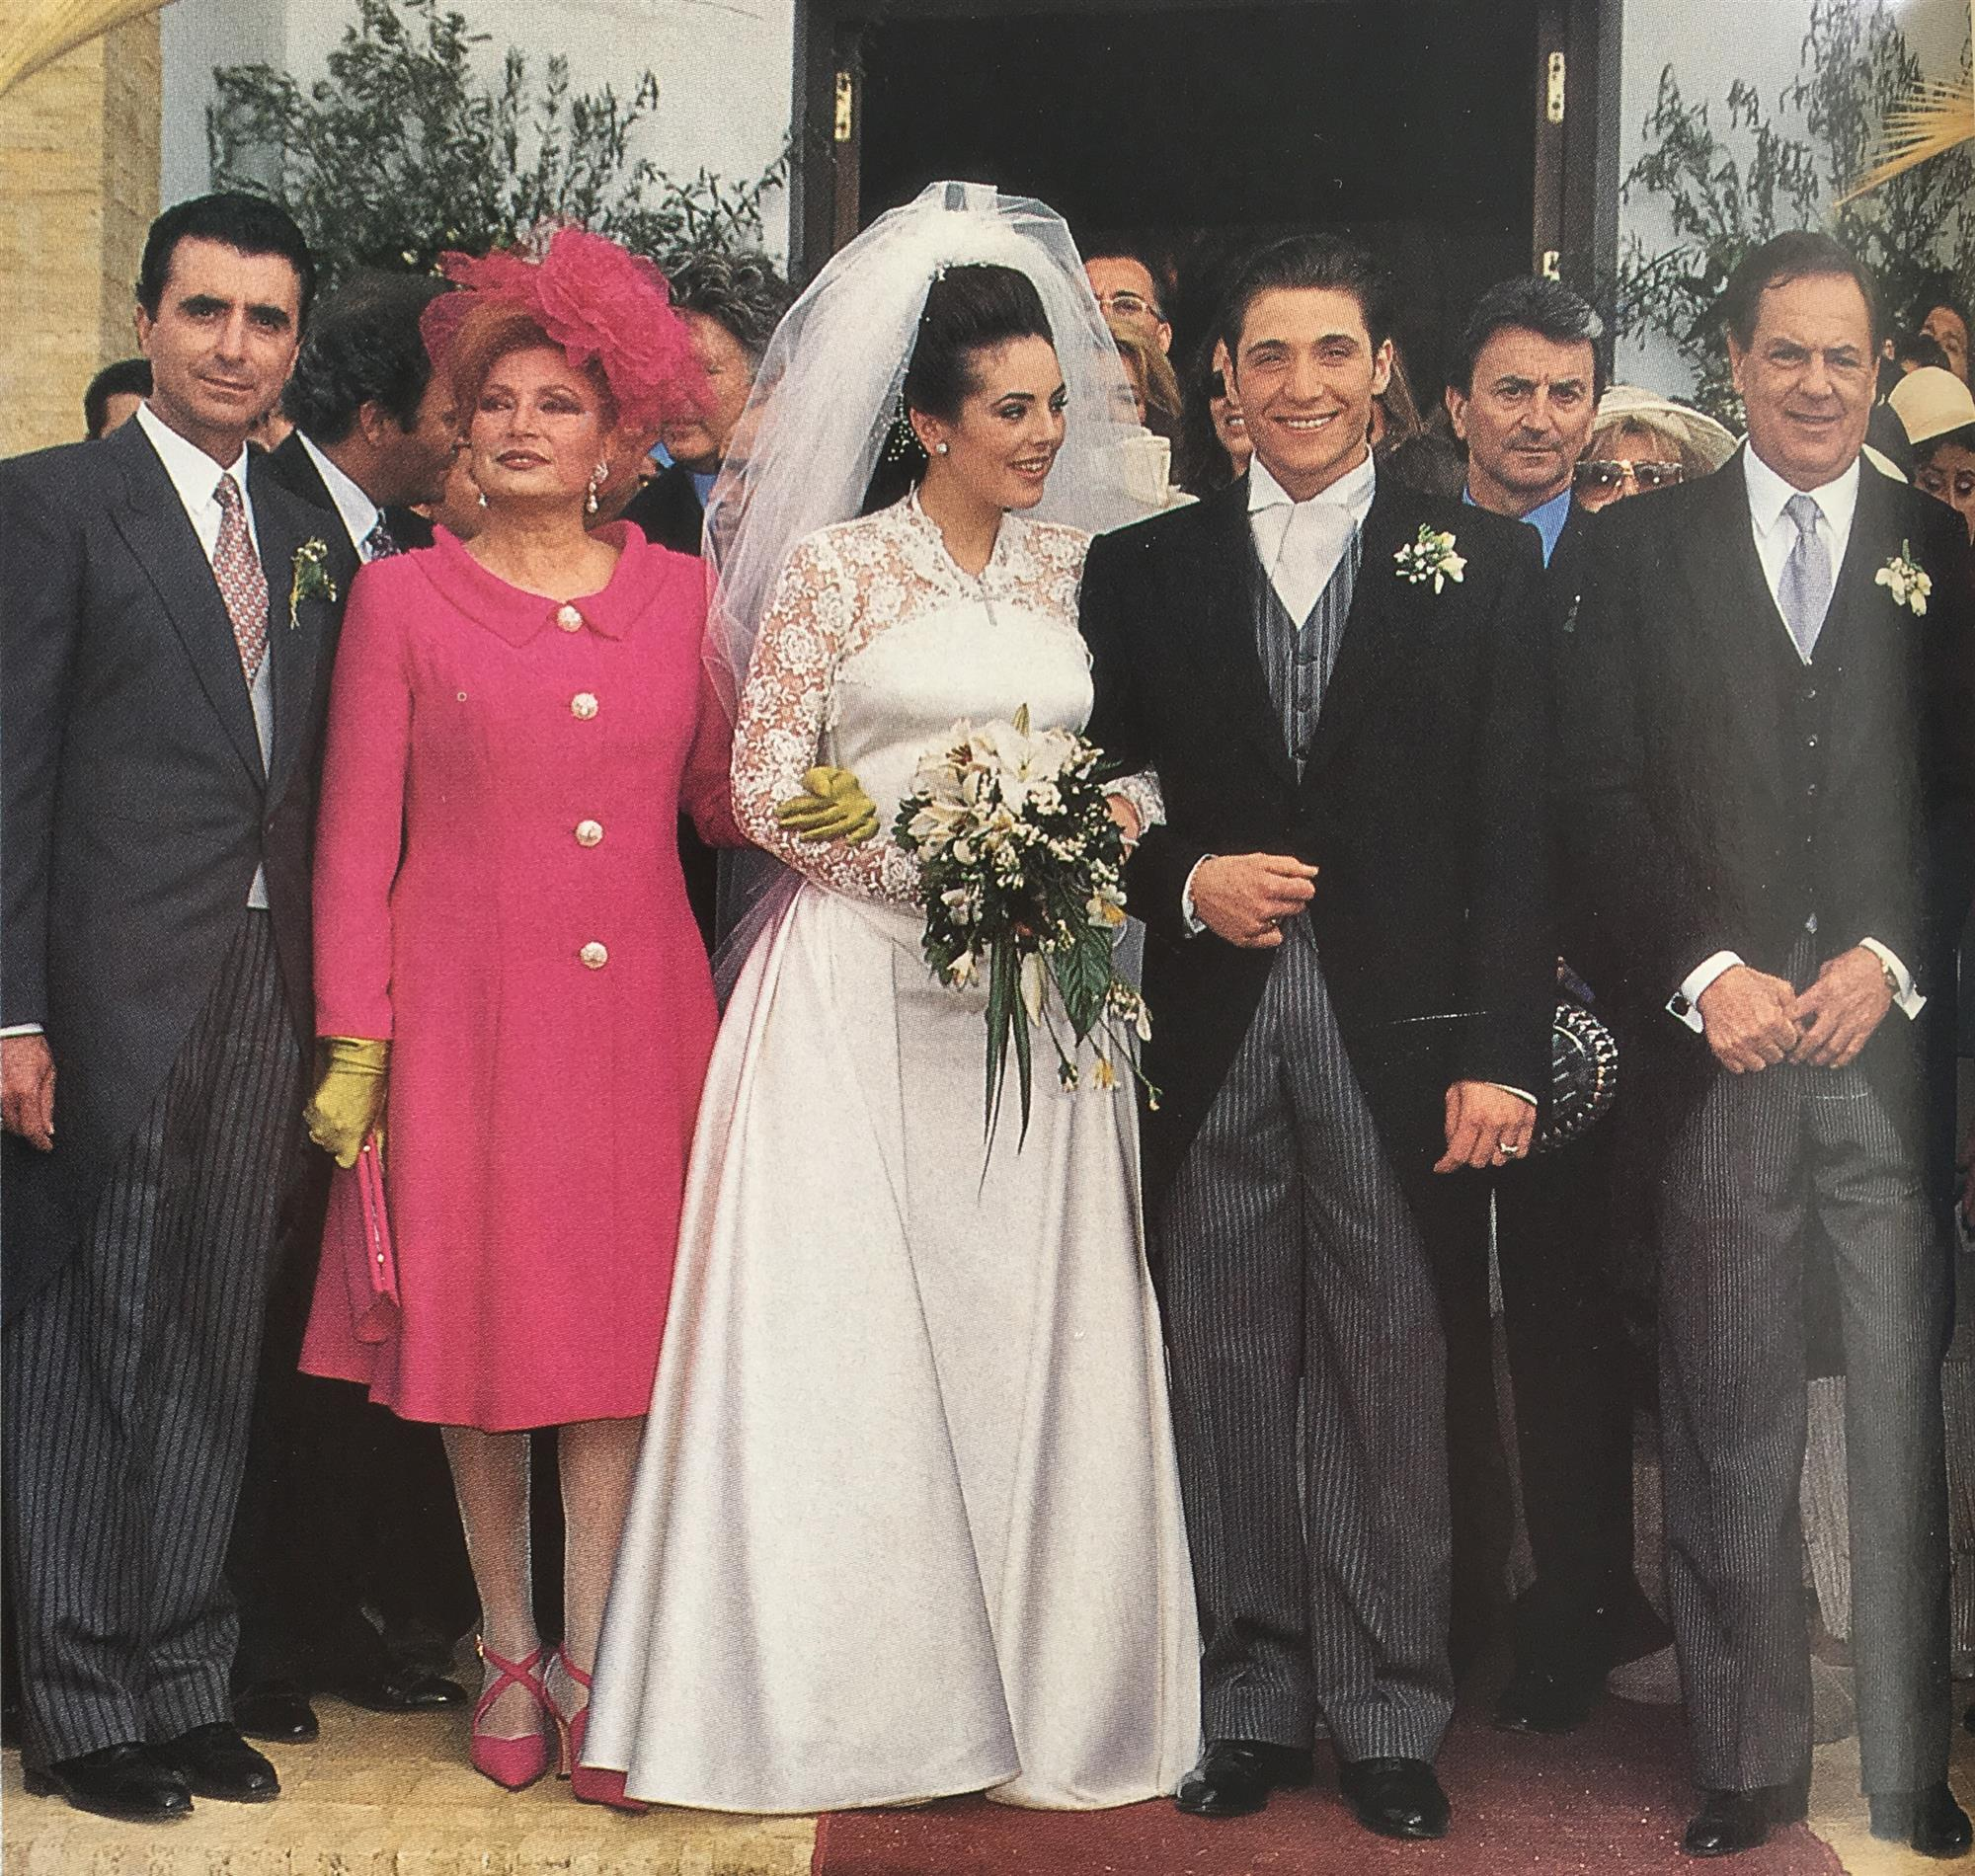 Vestido novia rocio carrasco